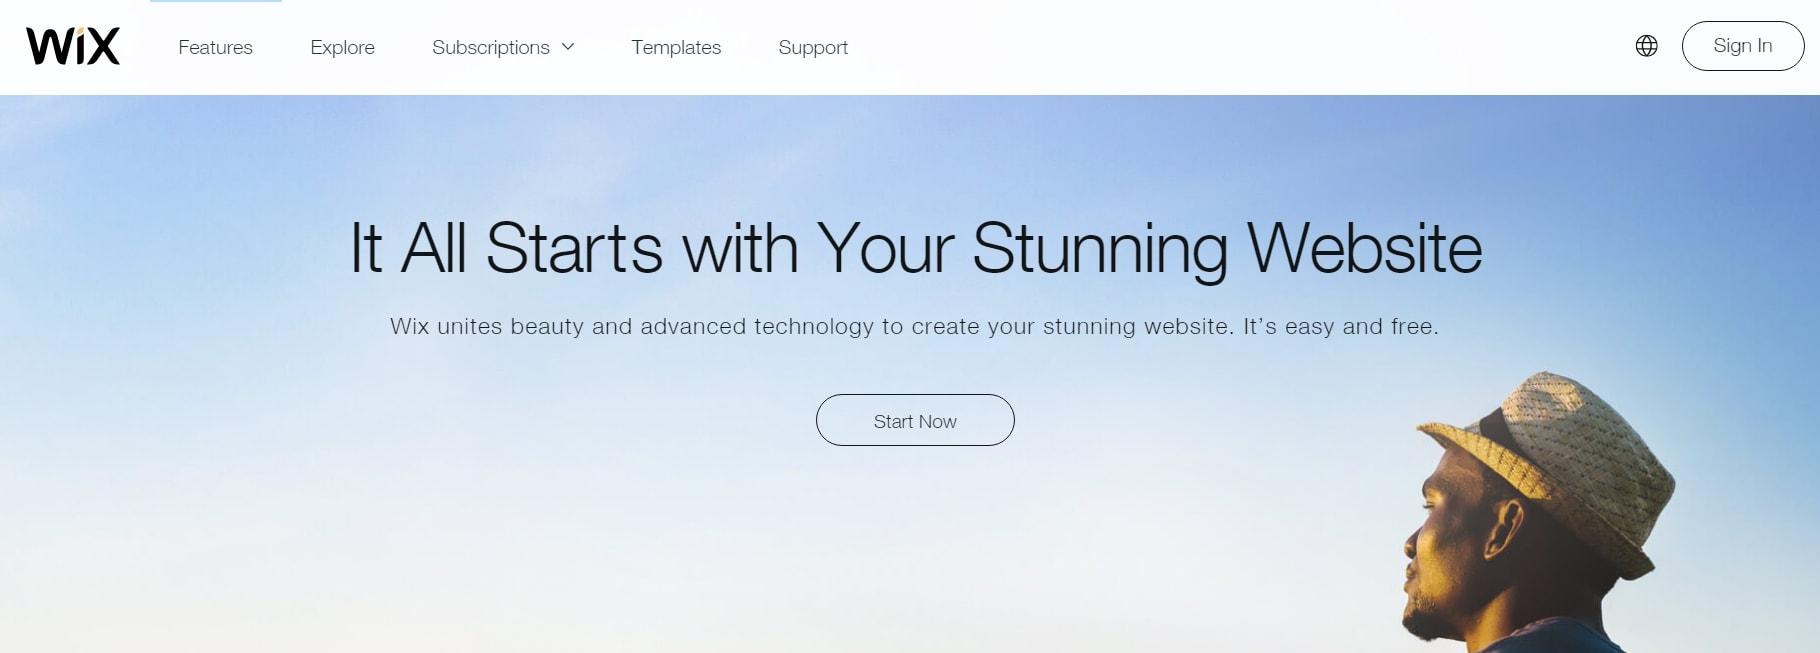 Wix-website-builder